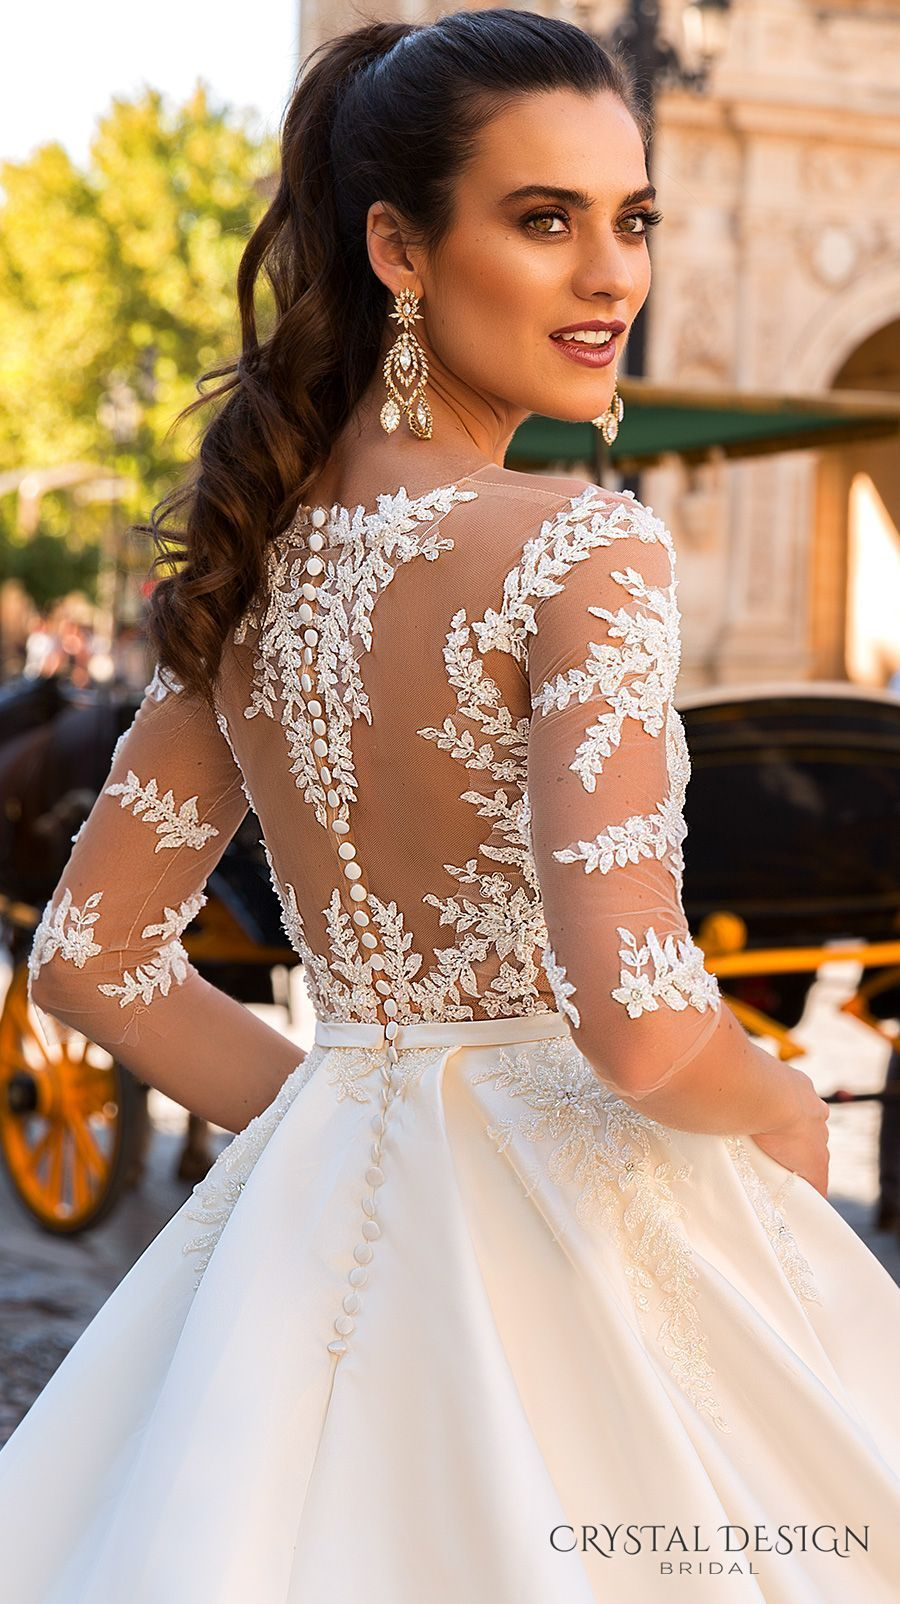 Crystal design bridal three quarter sleeves sheer boat